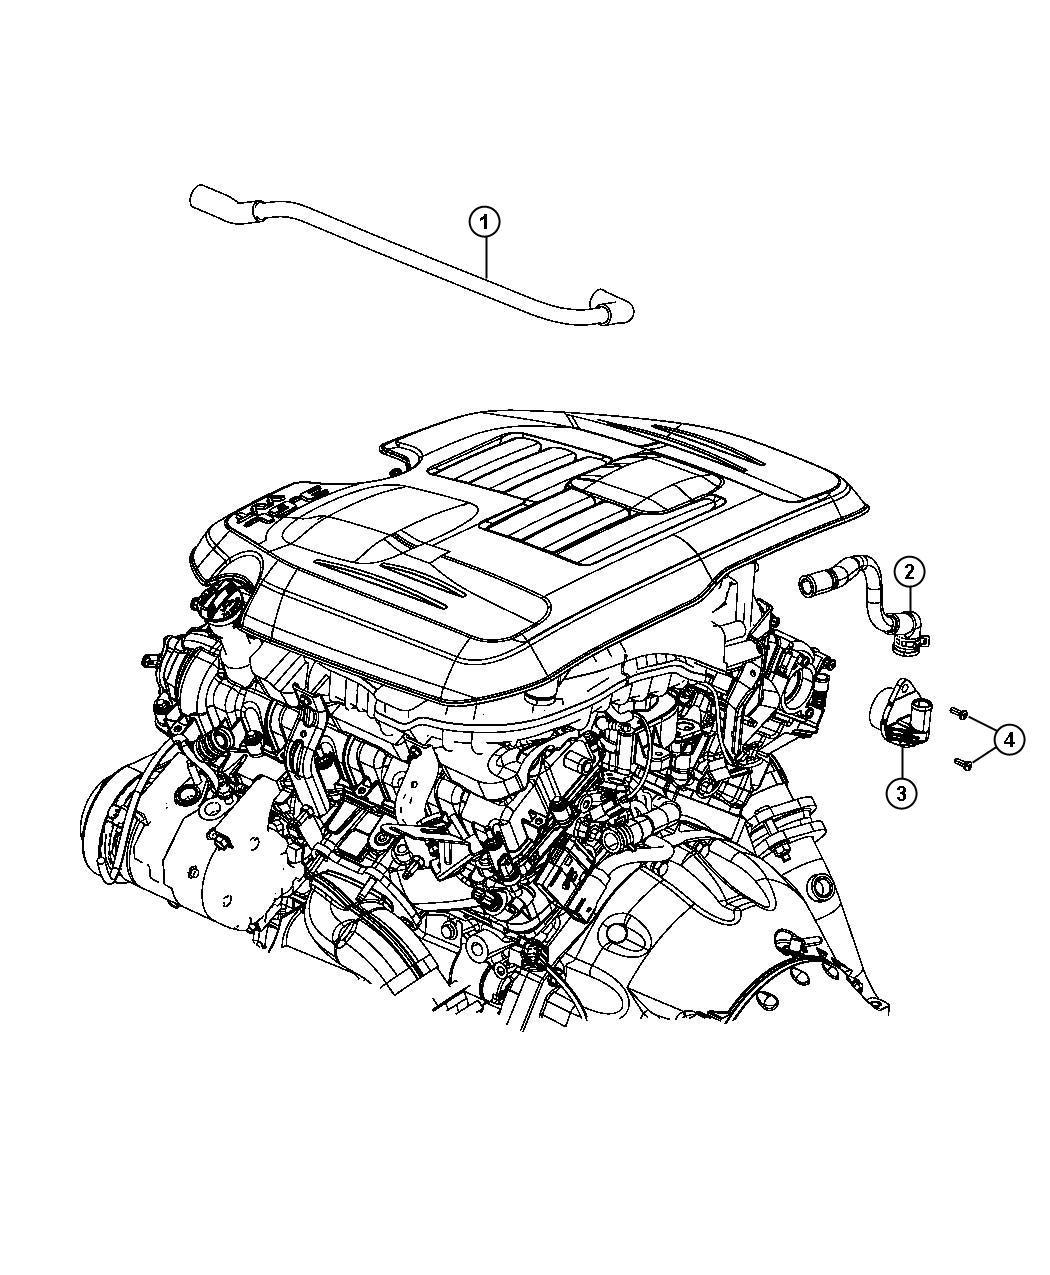 Dodge Charger Valve Pcv Engine Crankcase Ventilation